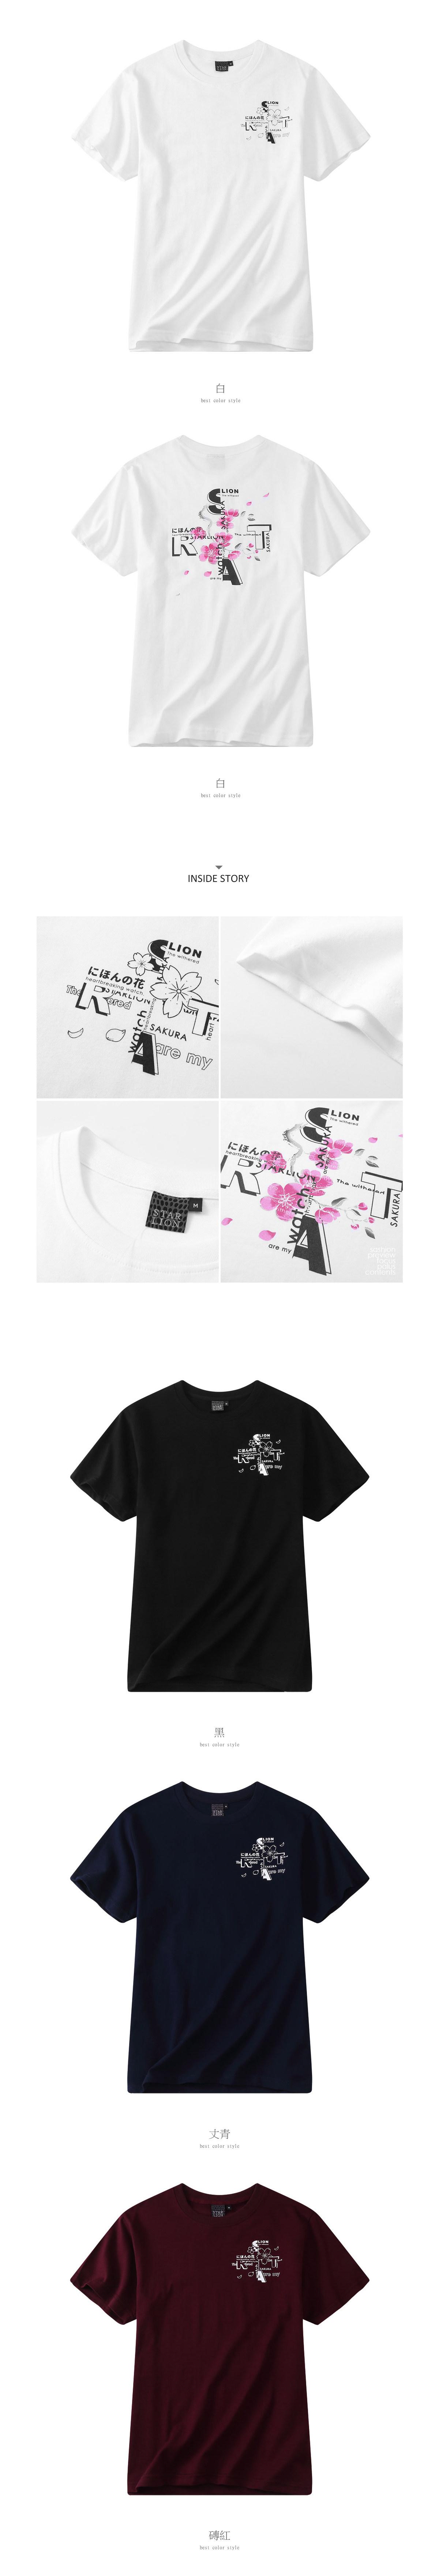 MIT櫻花元素文字短袖T恤